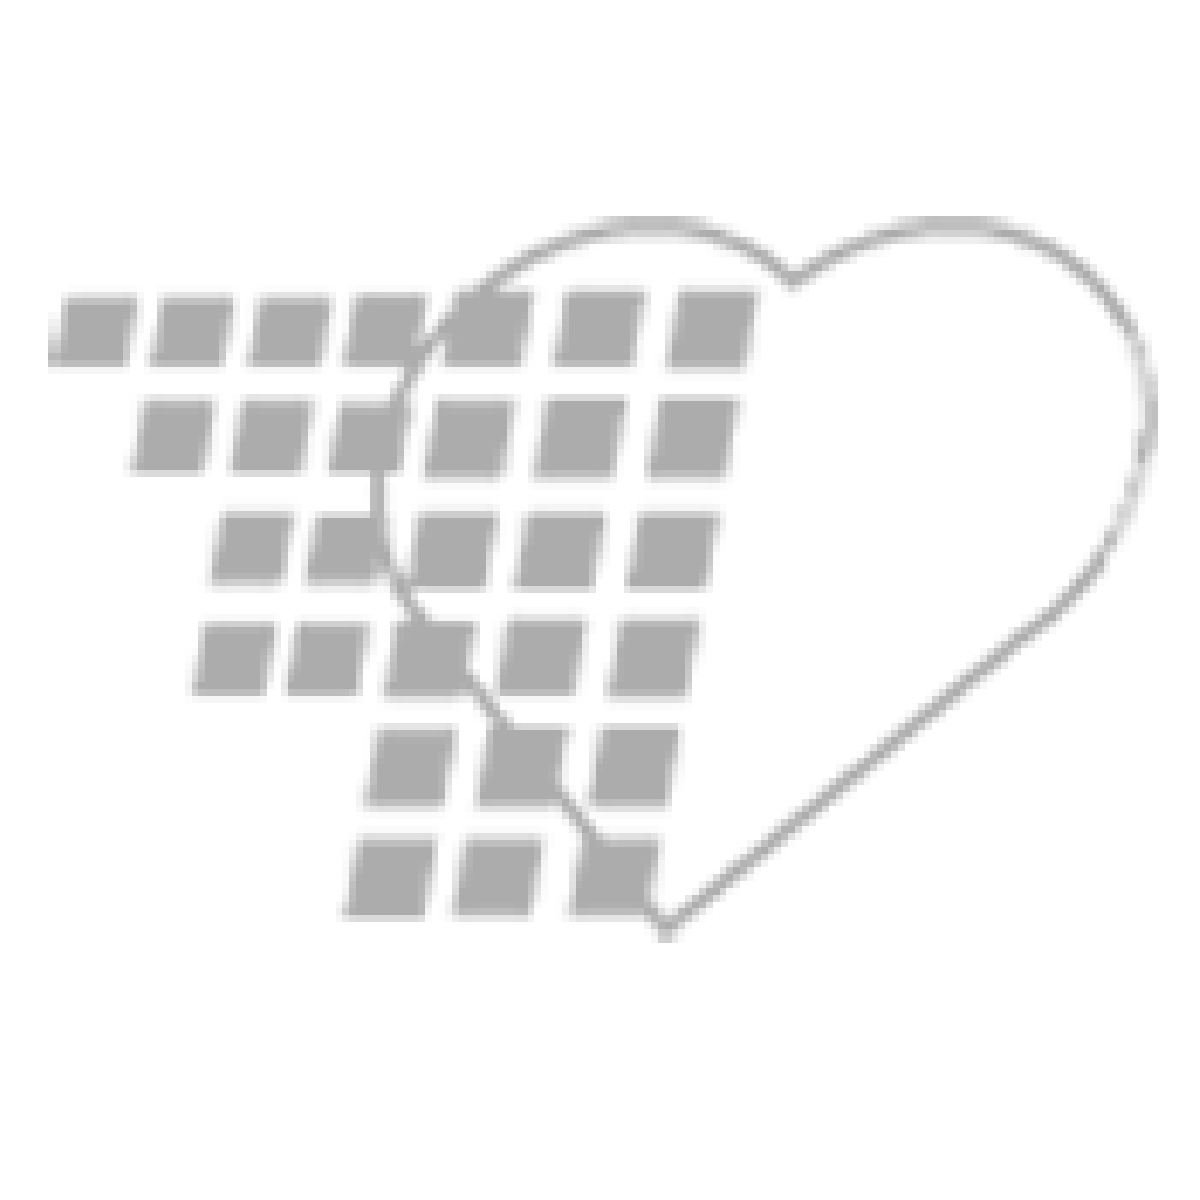 14-17-0028 - Simulaids Xtreme Trauma Deluxe Moulage Kit